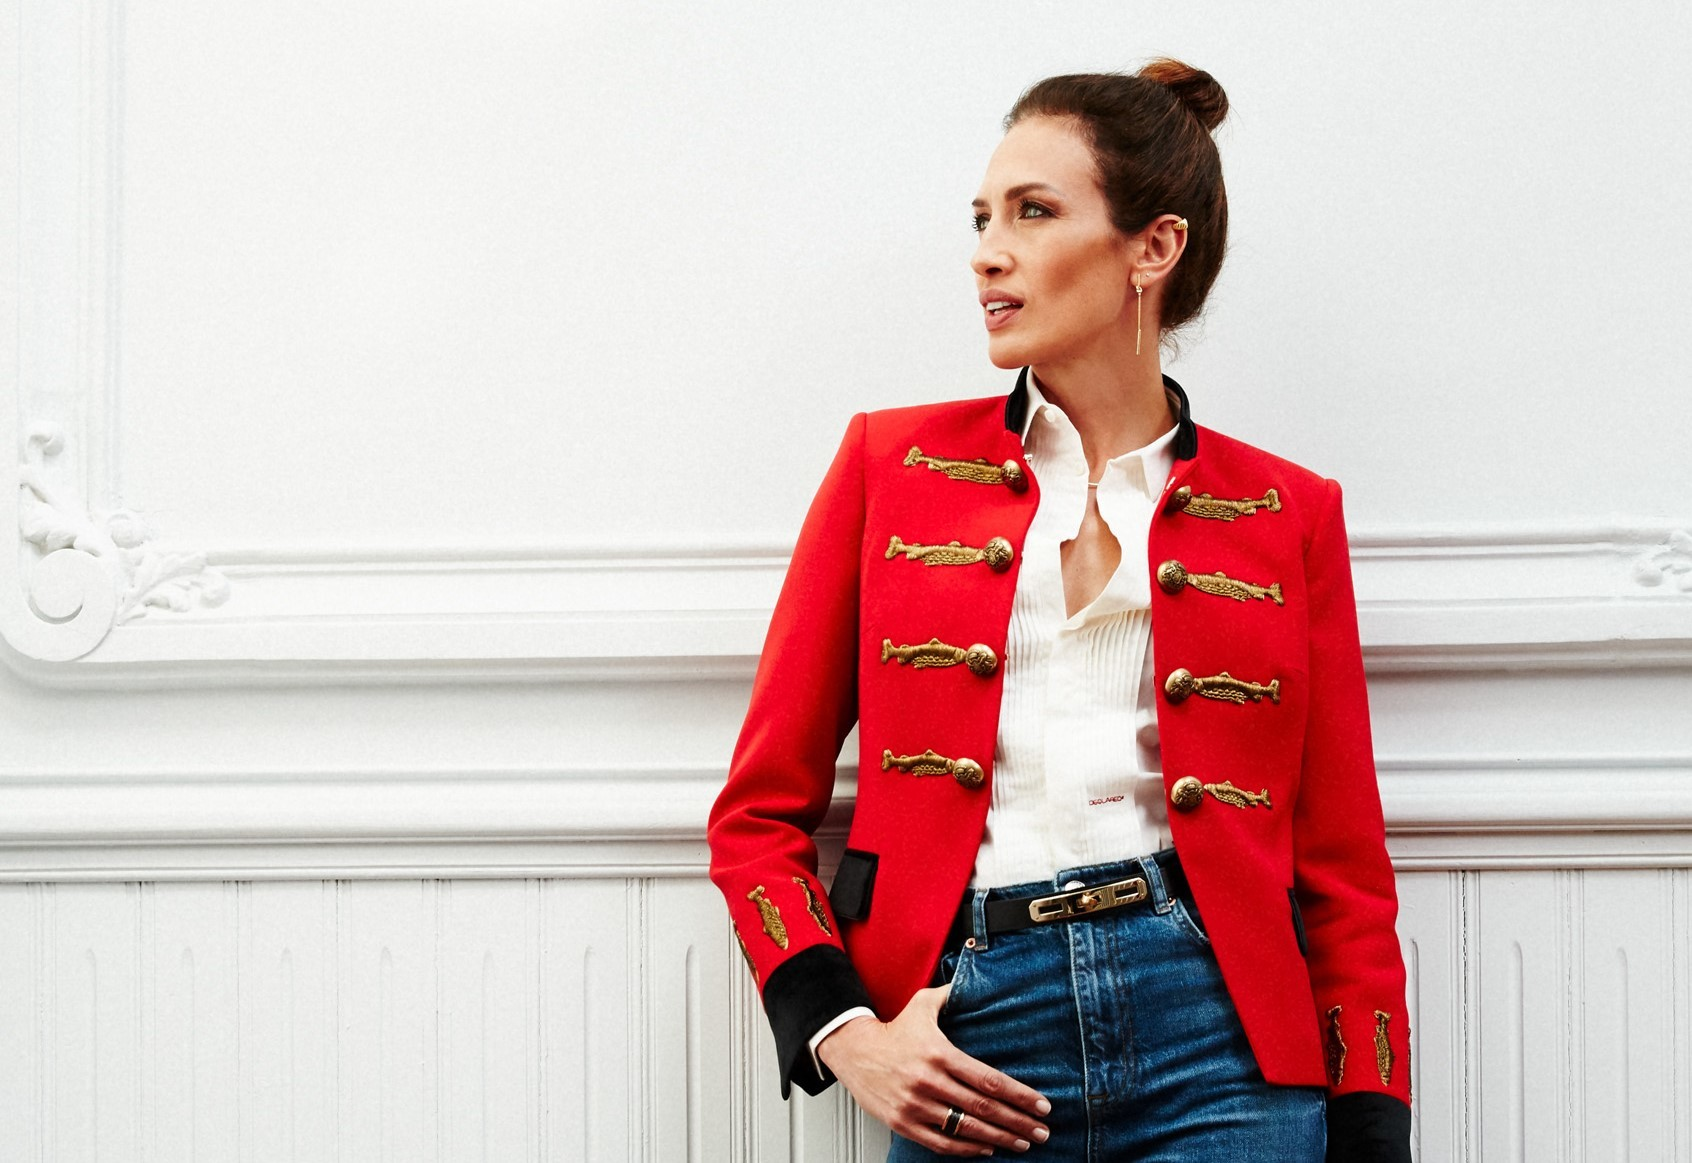 Nieves Álvarez con la chaqueta Nuvola roja, de The Extreme Collection X Nieves Álvarez.